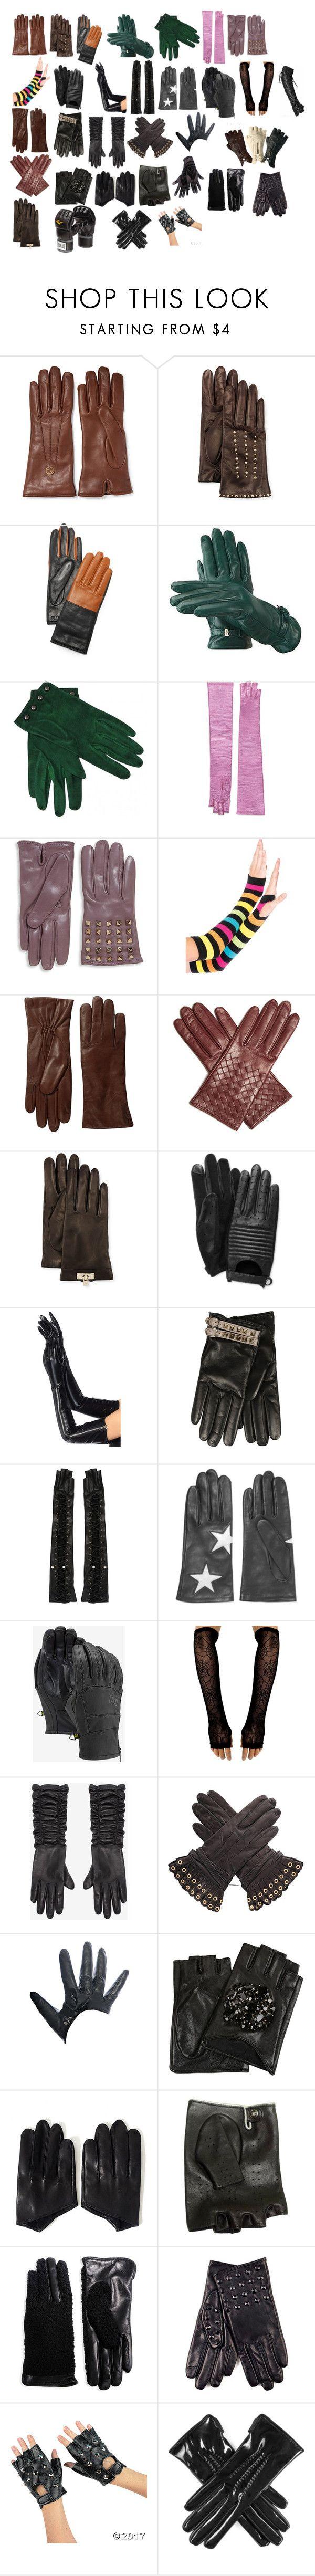 """Gloves 3"" by spellcasters ❤ liked on Polyvore featuring Gucci, Portolano, rag & bone, Aspinal of London, Hermès, Valentino, Hestra, Bottega Veneta, Lauren Ralph Lauren and AGNELLE"